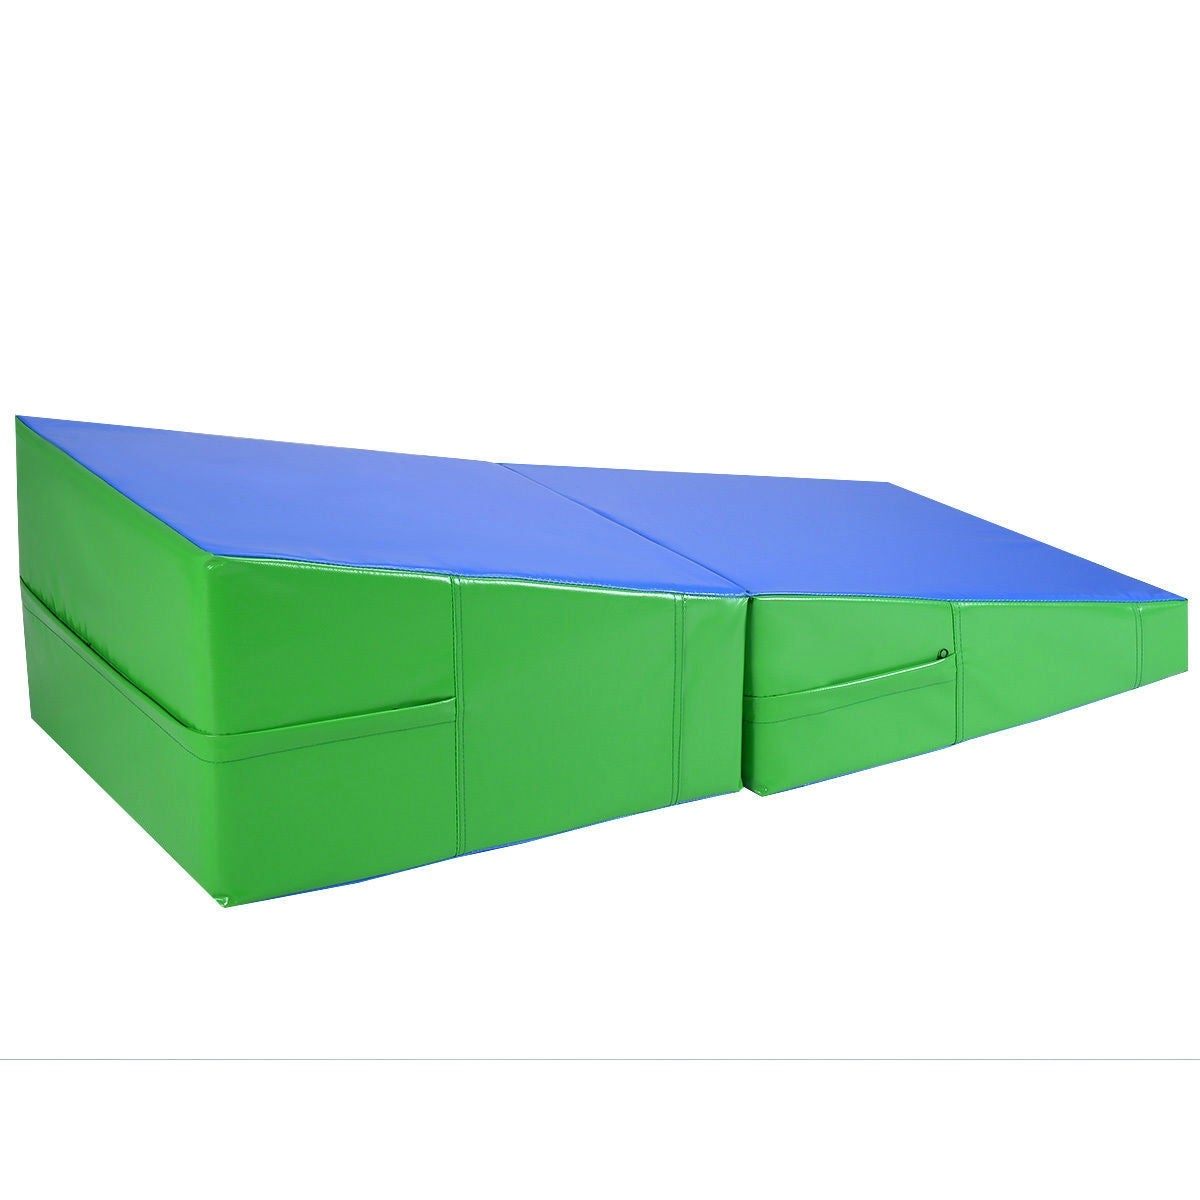 sports gym incline eq aerobics wedge mat tumbling ramp d itm mats gymnastics exercise